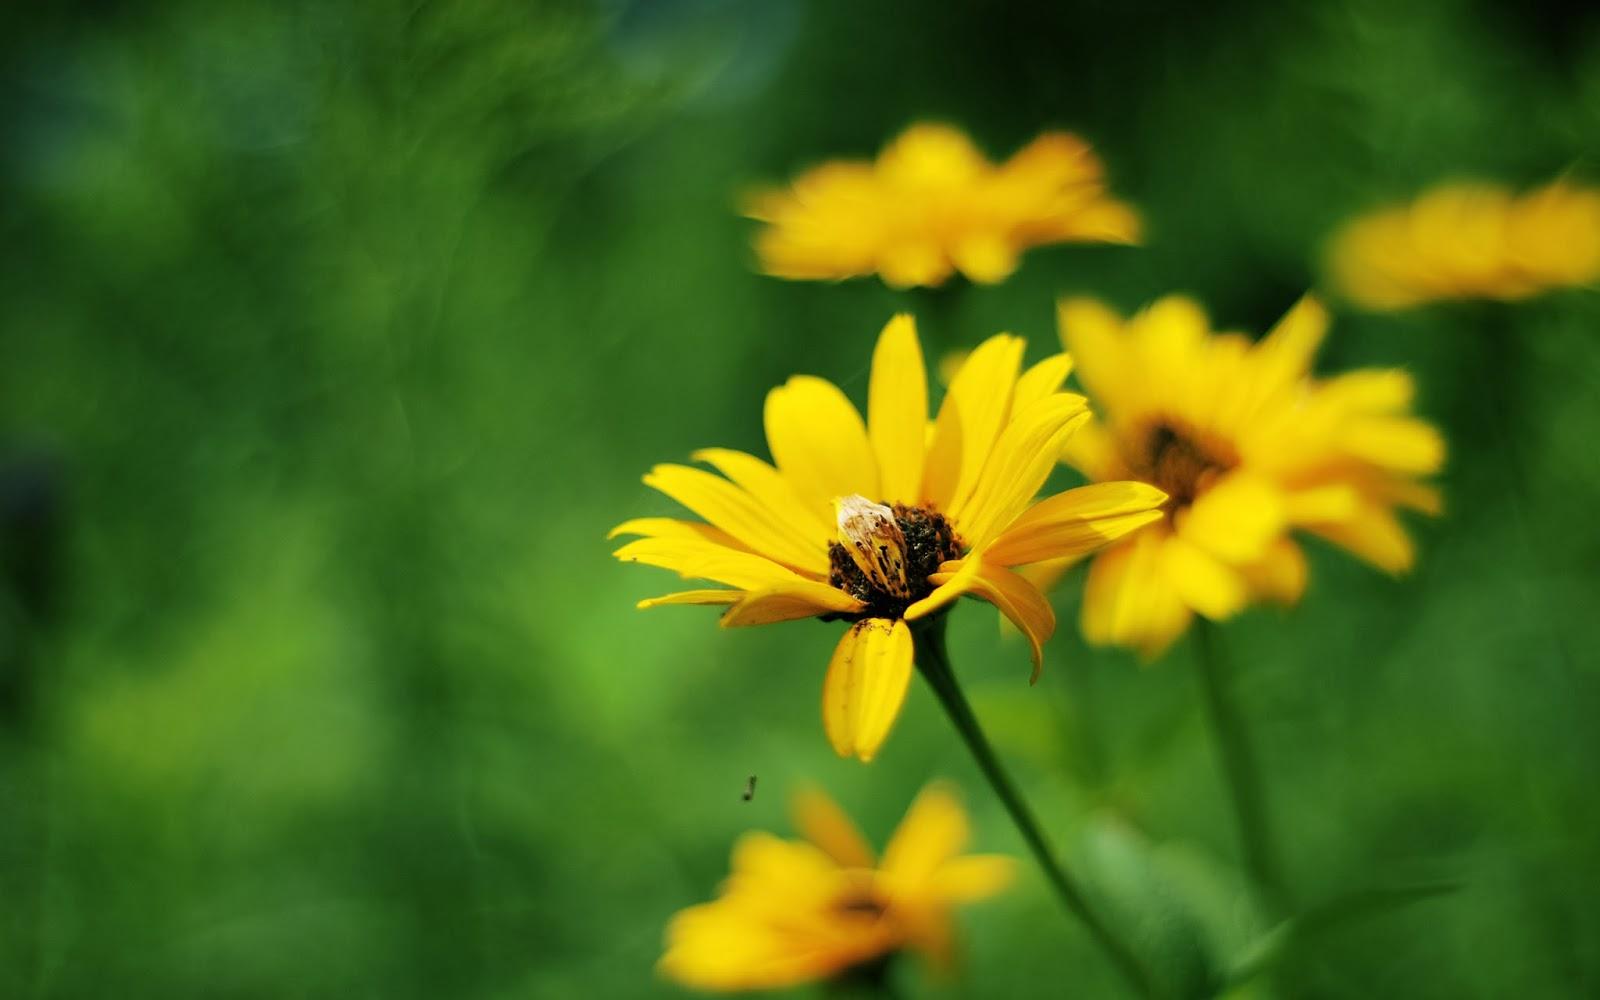 "<img src=""http://1.bp.blogspot.com/-bja5VO9UKBE/UuFjCcCAEvI/AAAAAAAAJ_4/J7Qat6qoOJY/s1600/yellow-summer--flowers-wallpaper.jpg"" alt=""yellow summer flower wallpaper"" />"